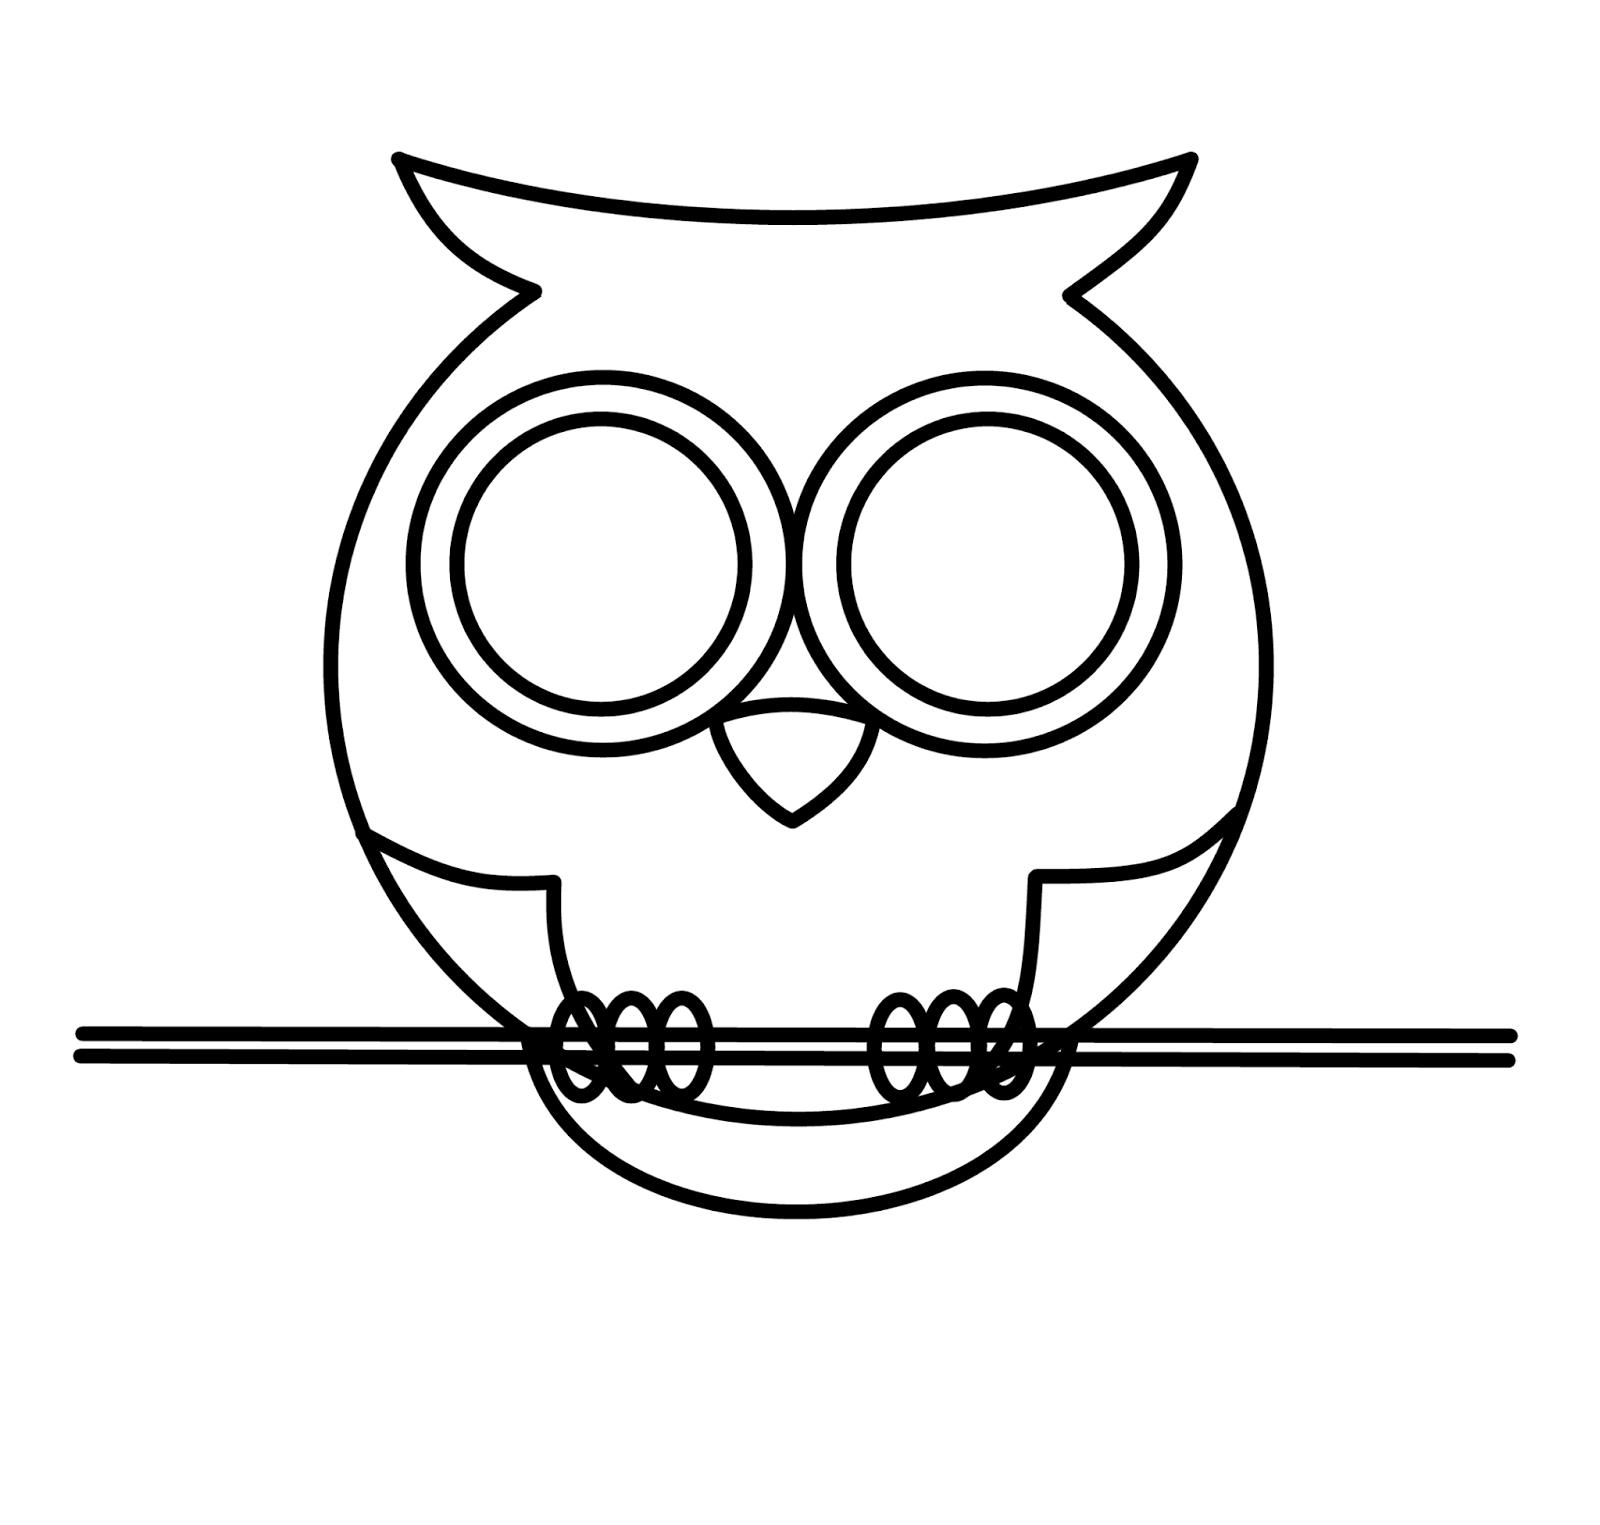 How to draw an owl cartoon for Cartoon owl sketch